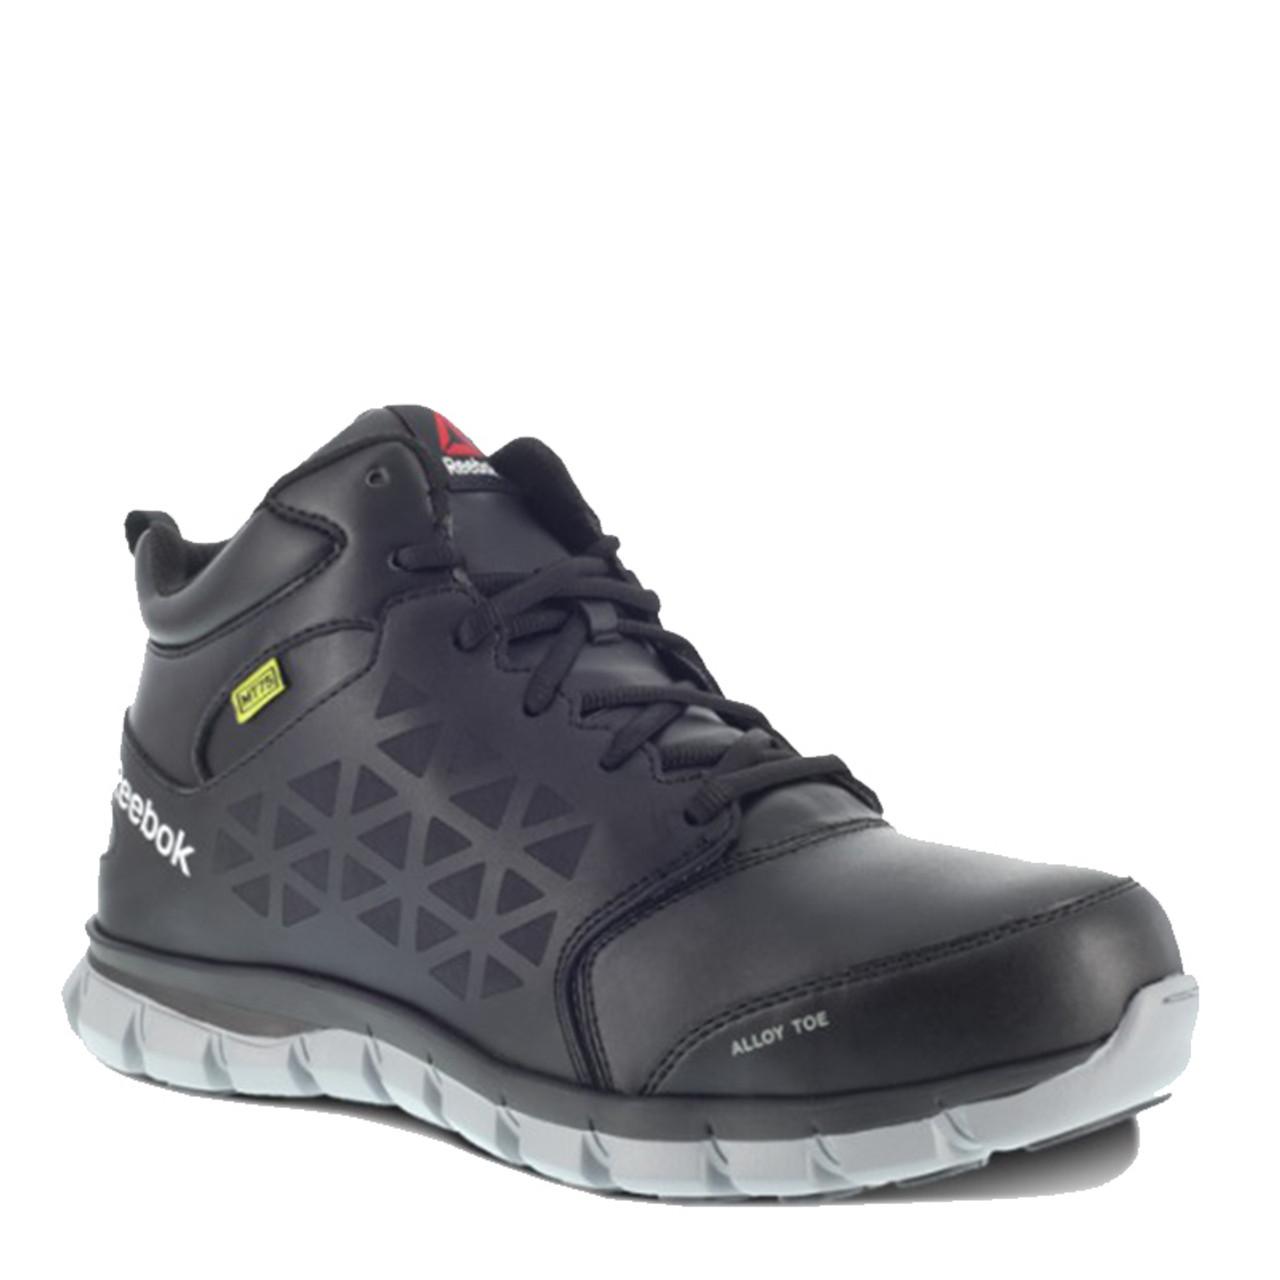 77deda5fbbf78 Reebok RB4143 SUBLITE MET GUARD Safety Toe Work Shoes